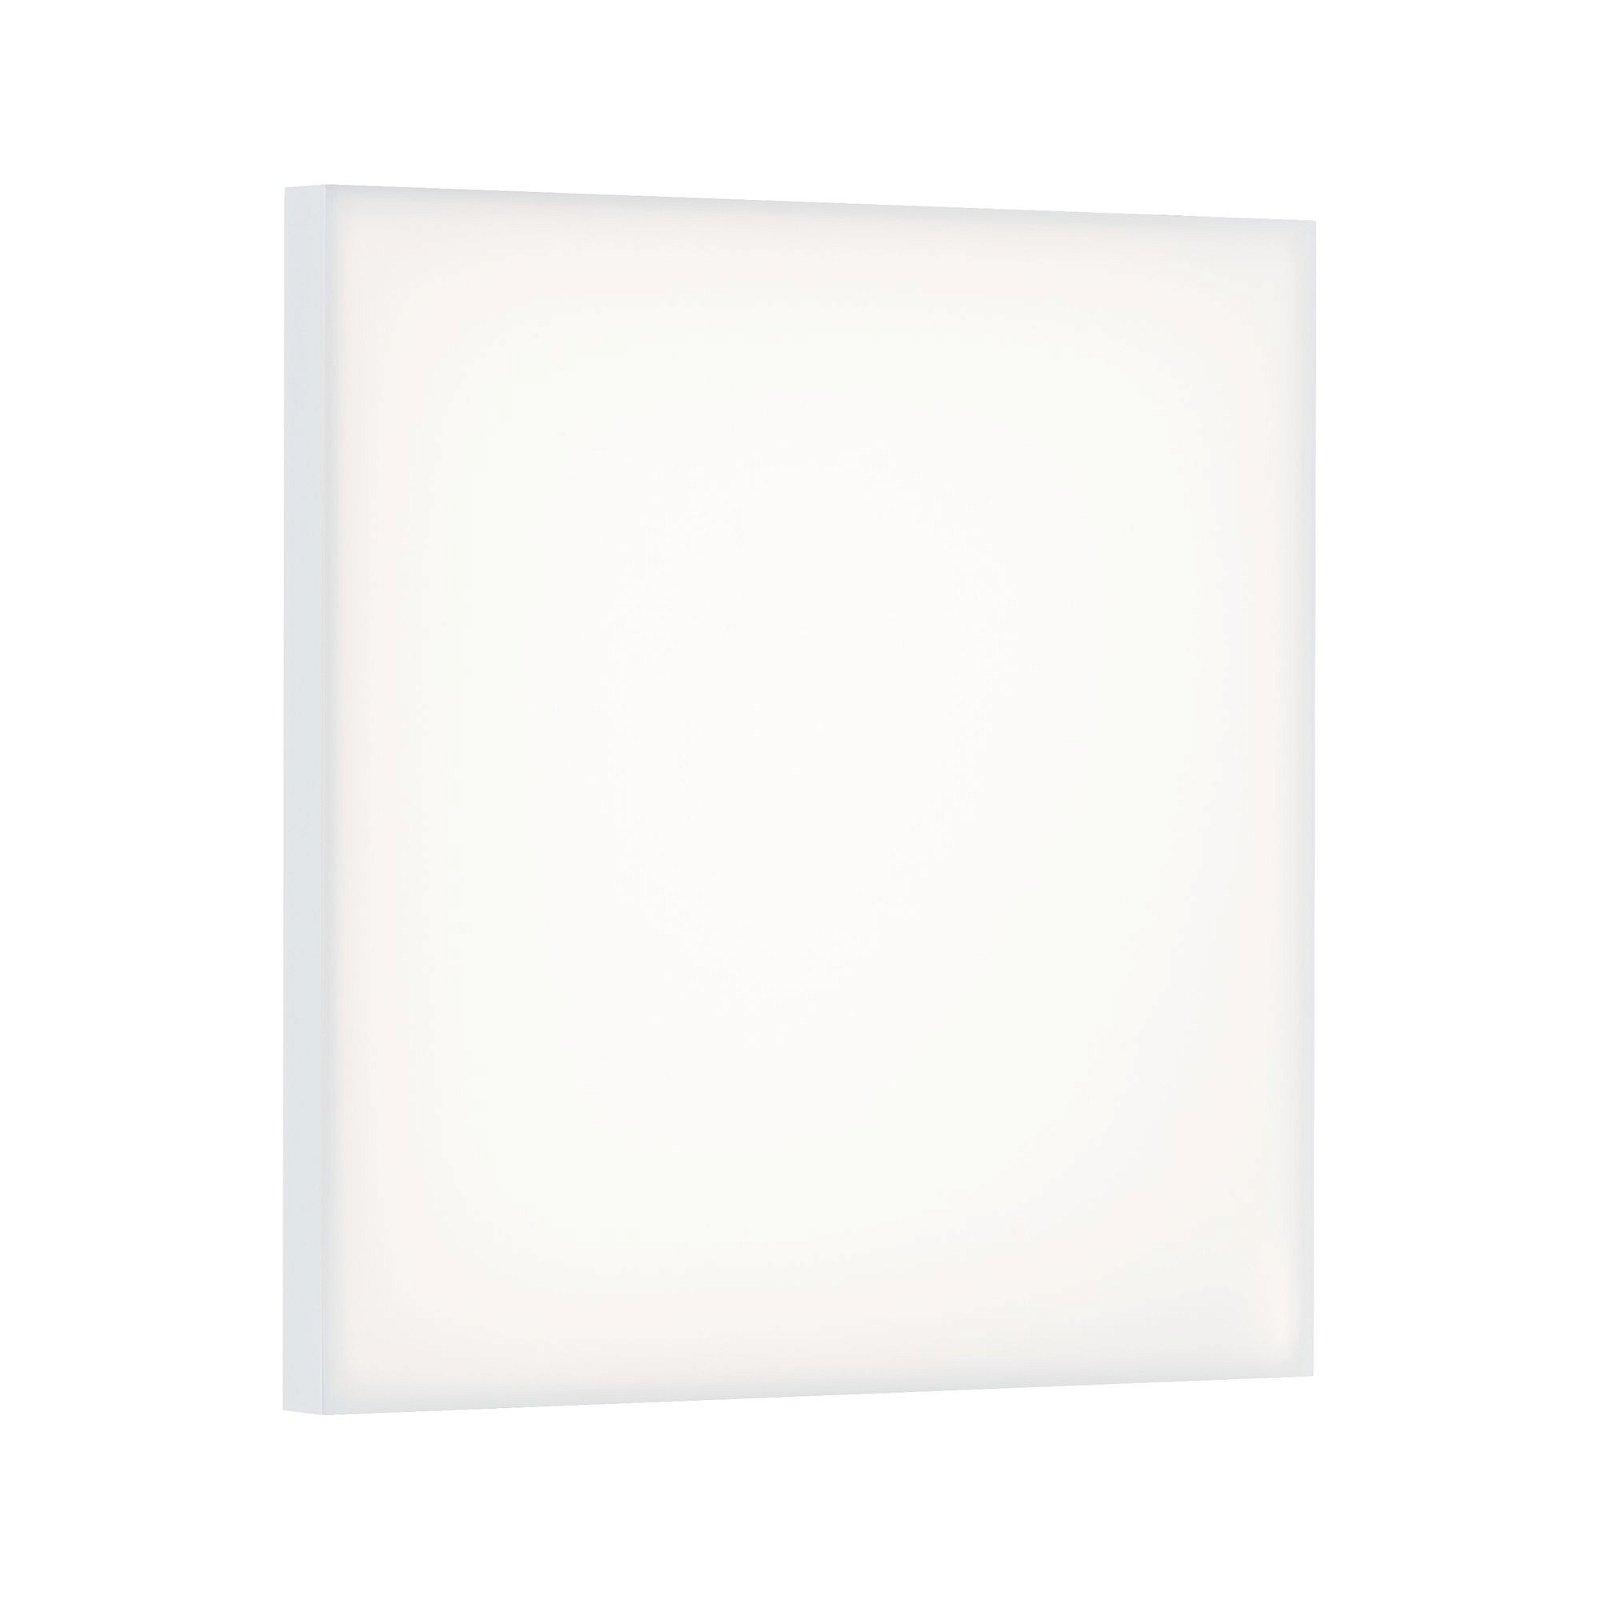 LED Panel Velora square 295x295mm 2100lm 3000K Matt white